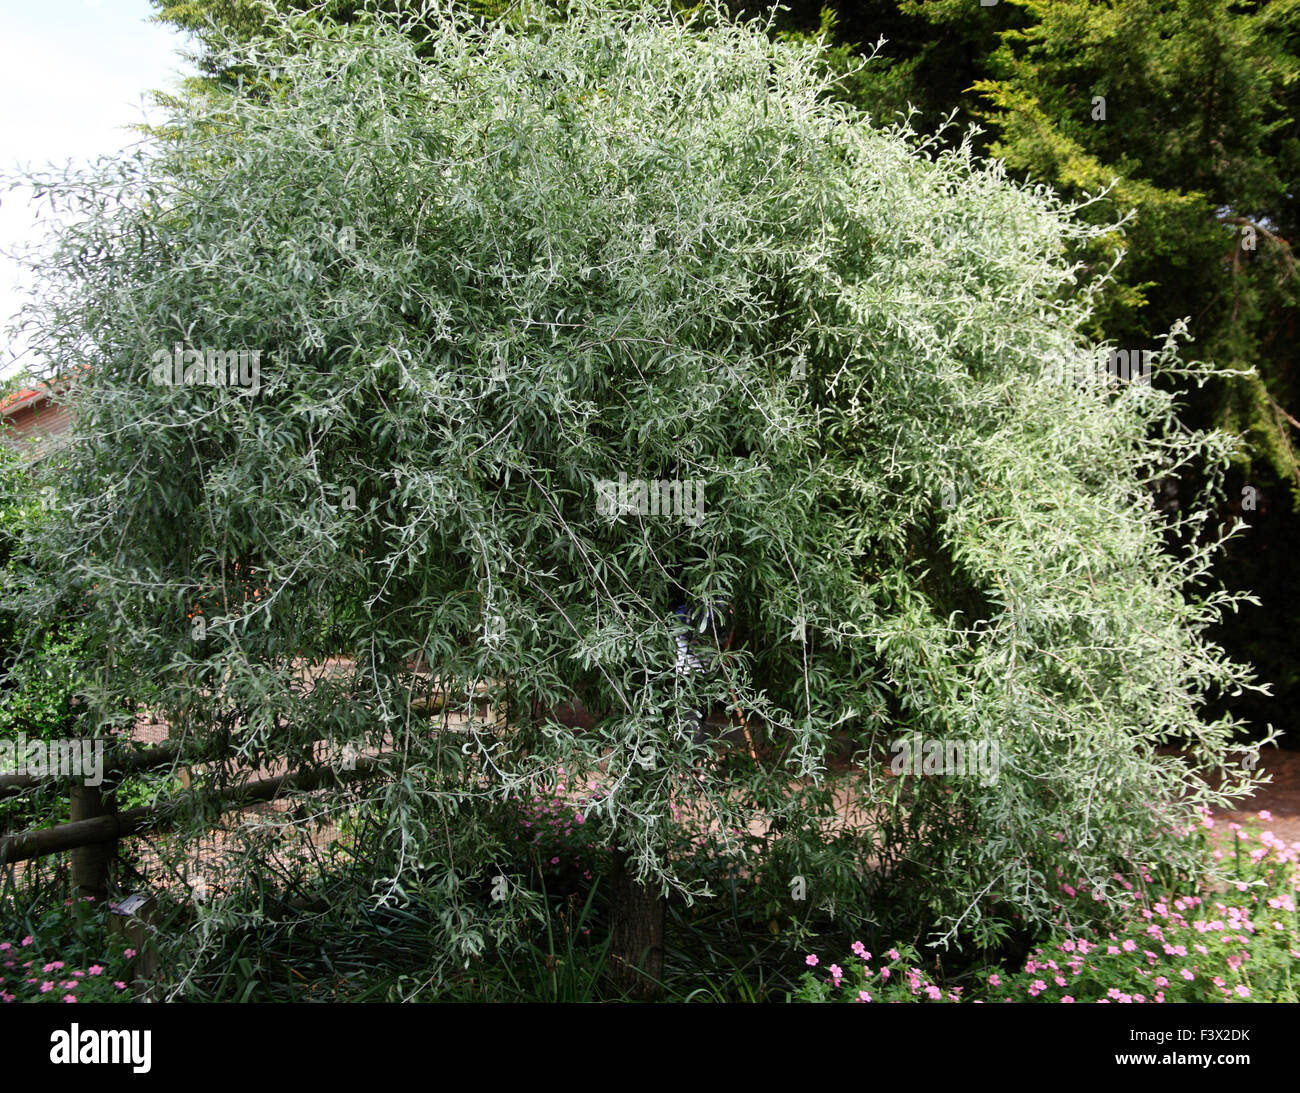 Pyrus salicifolia 'Pendula' Willow leaved Pear close up of tree - Stock Image